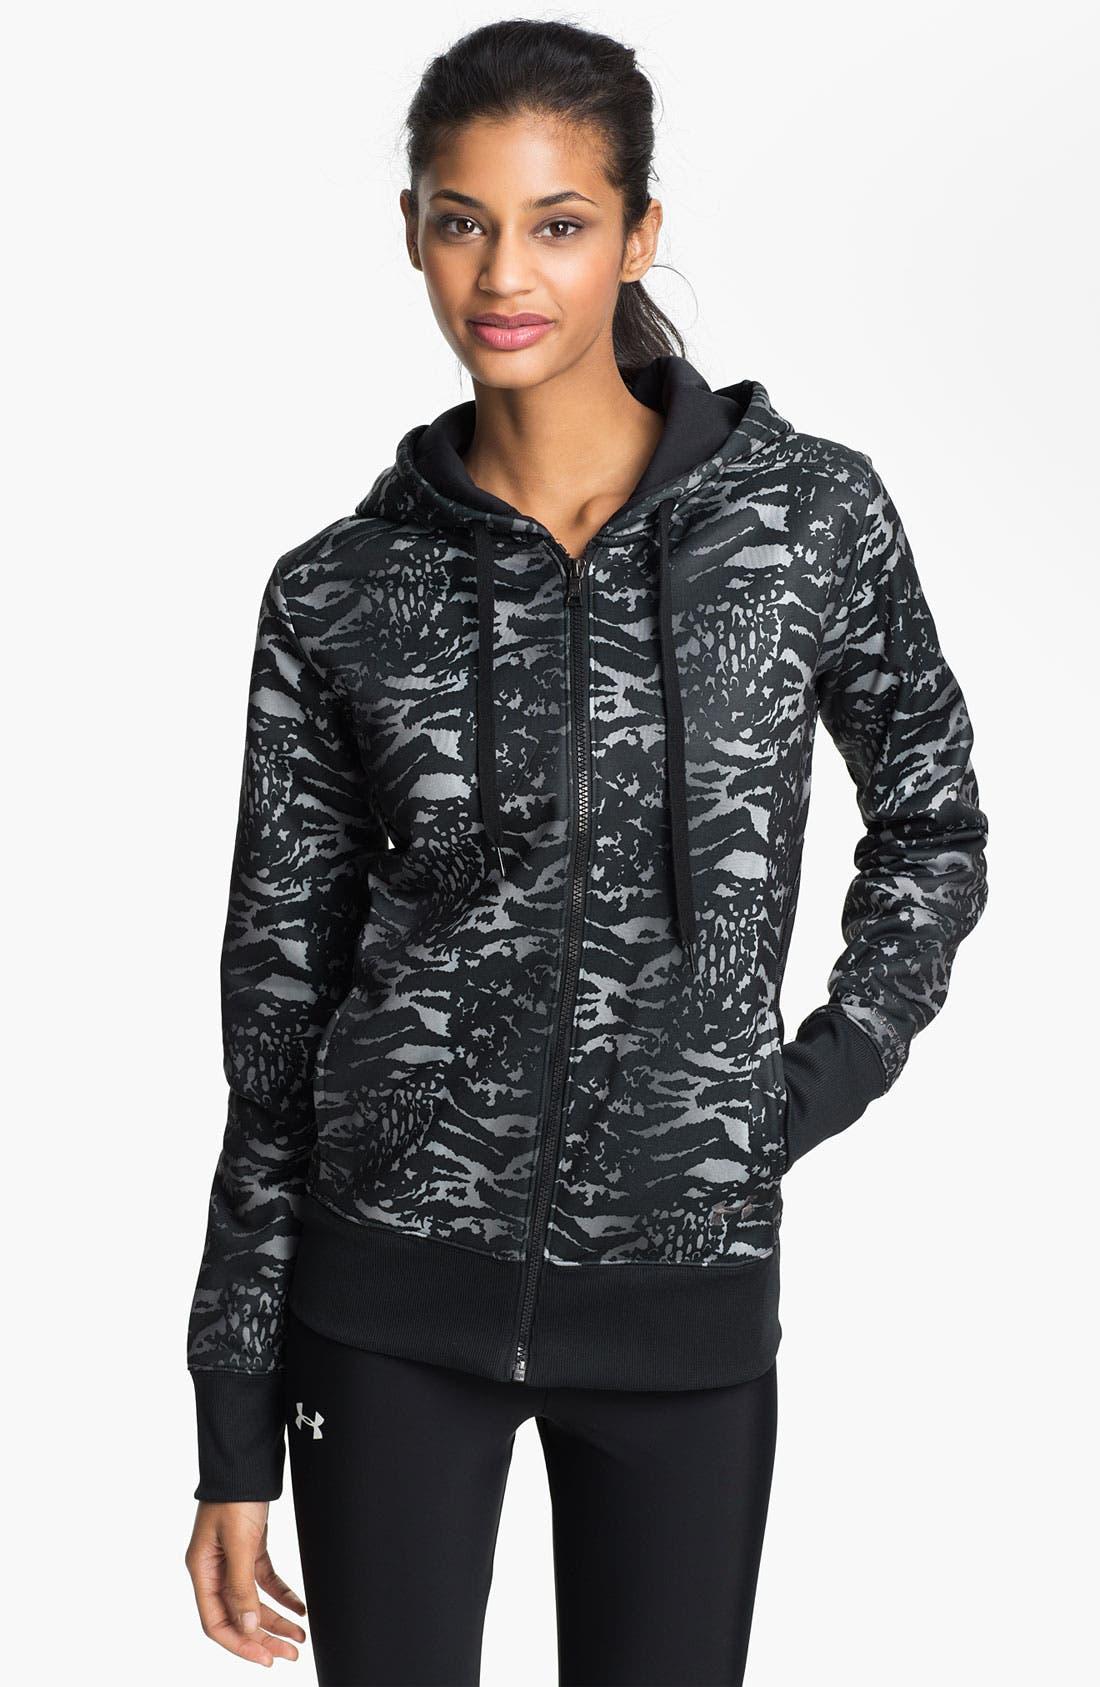 Main Image - Under Armour 'Armour Fleece®' Graphic Zip Up Hoodie